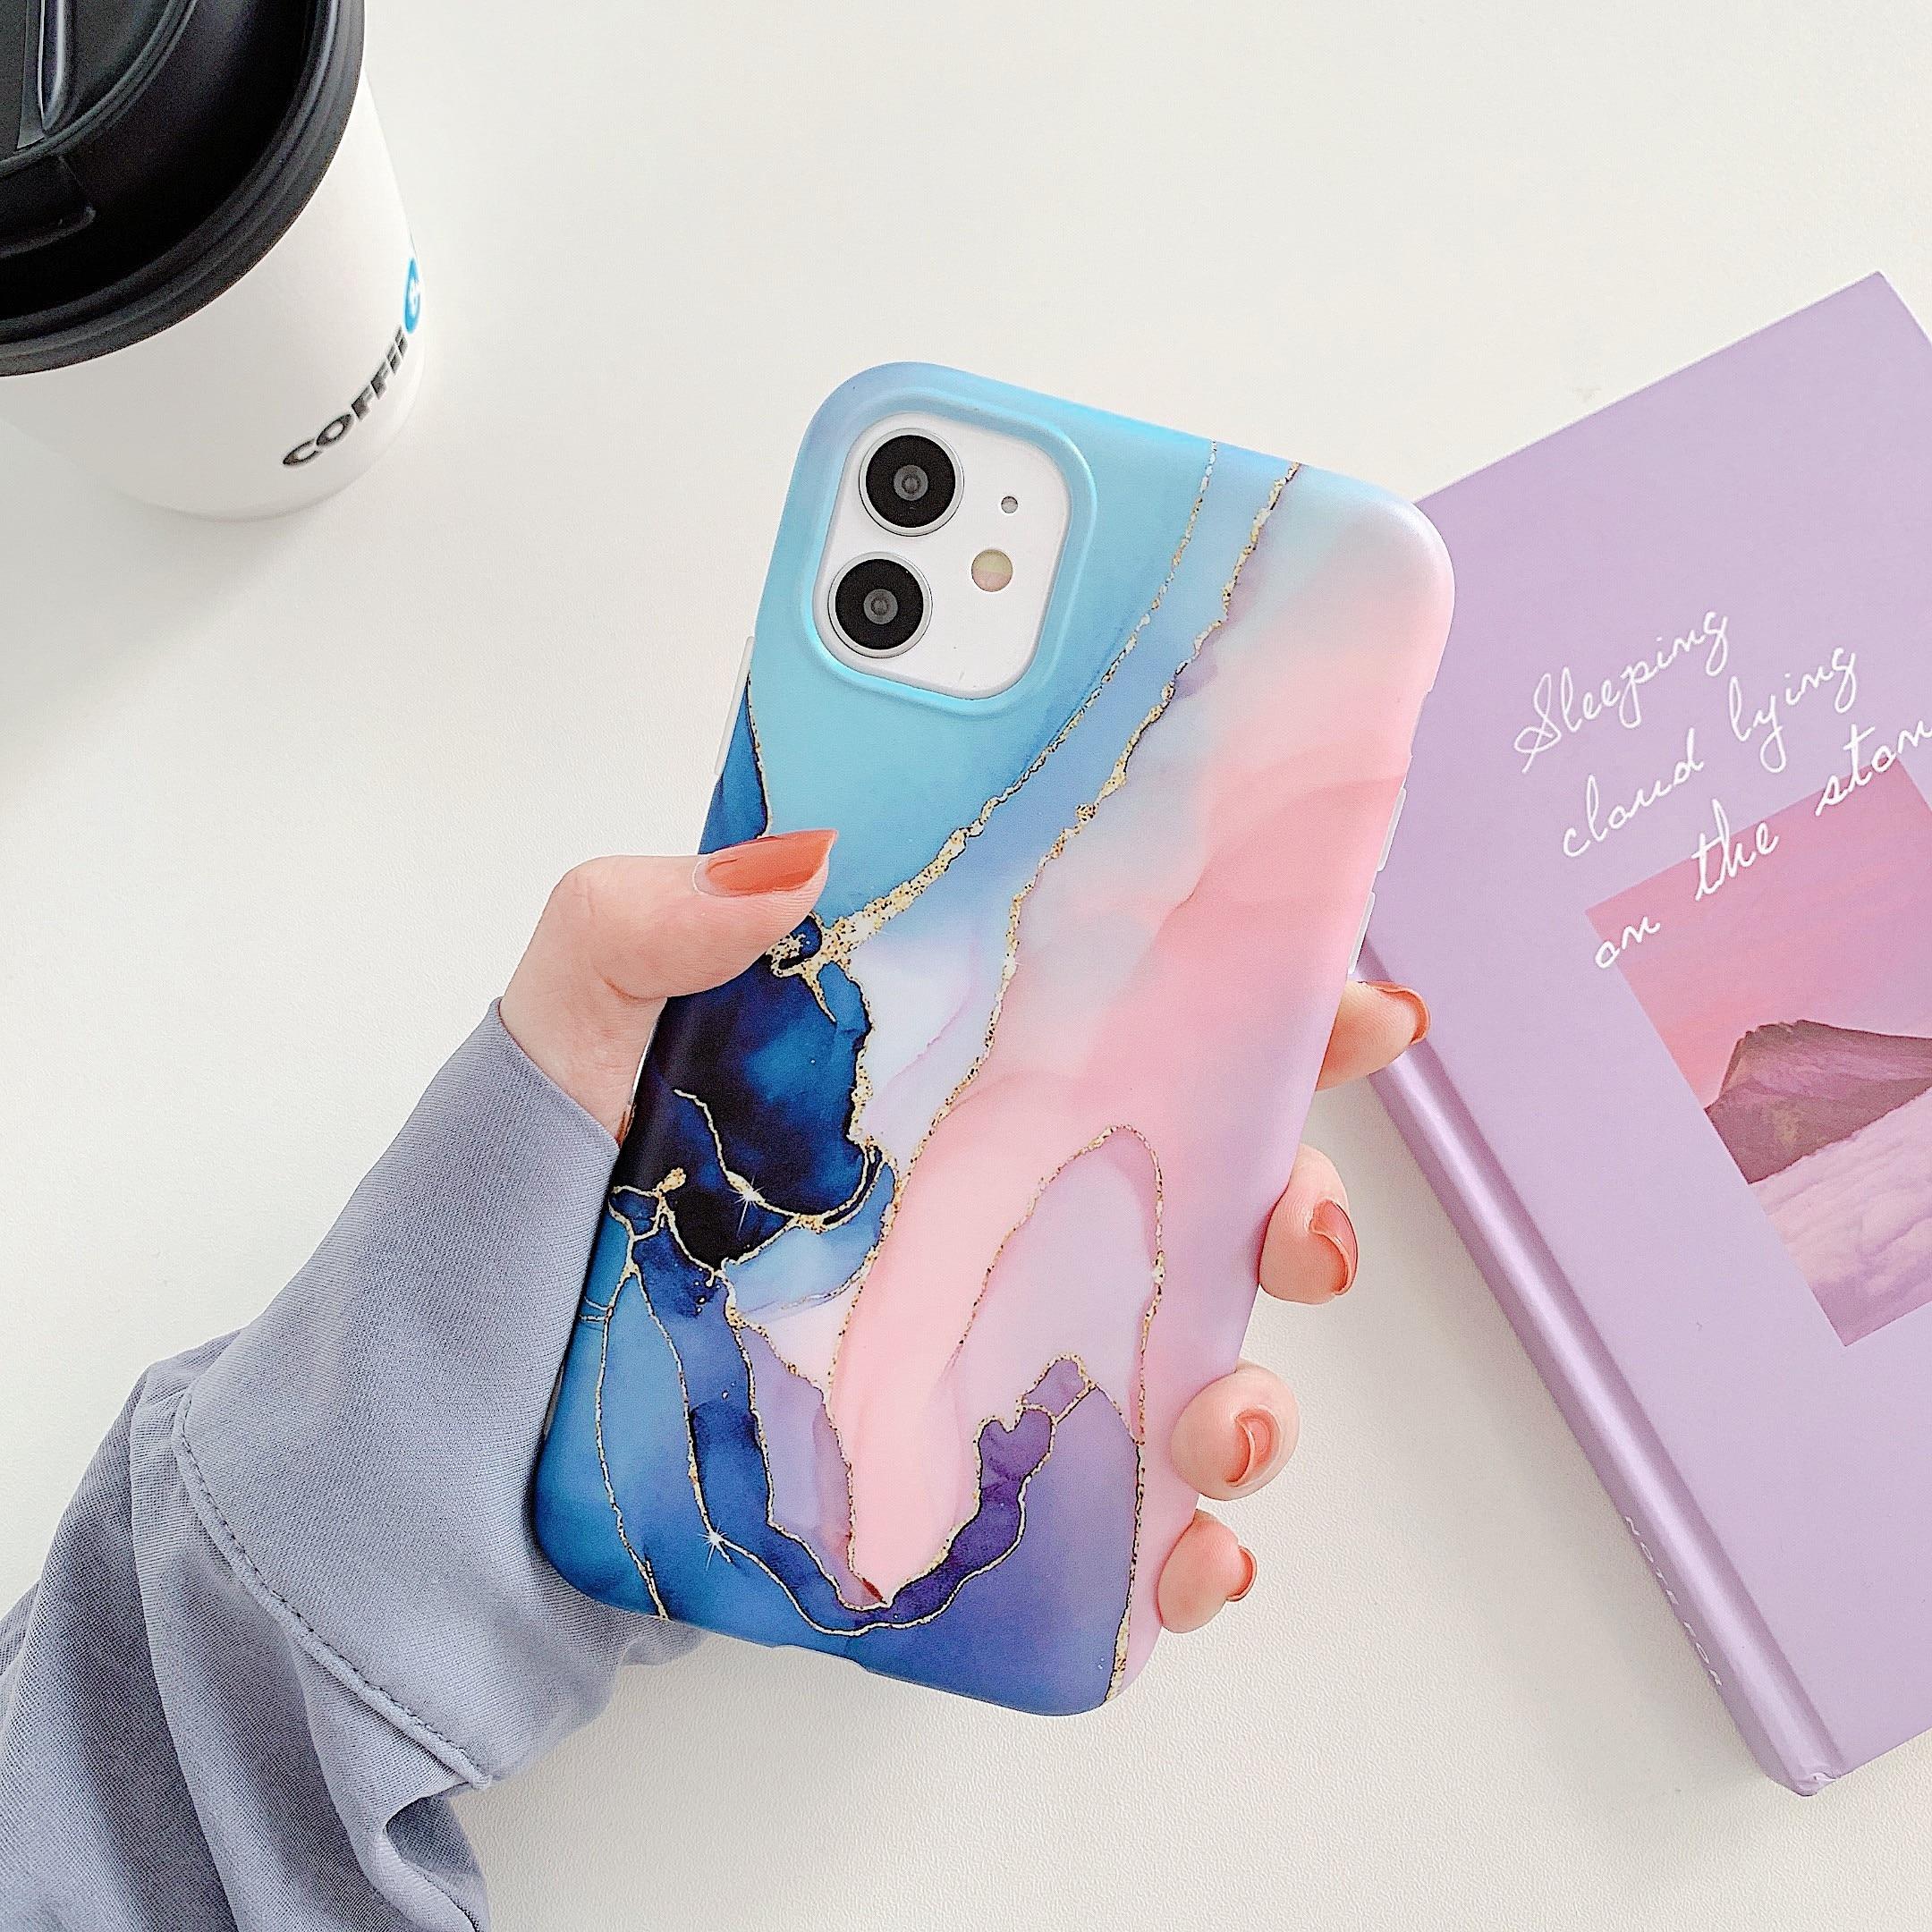 Hb638efb1436940eda8eeb06a97cb8295e Capinha celular case Mármore rachadura matte casos de telefone para iphone 12 mini 11 pro max se 2020 xs max xr x 7 8 plus capa de silicone macio tpu imd volta